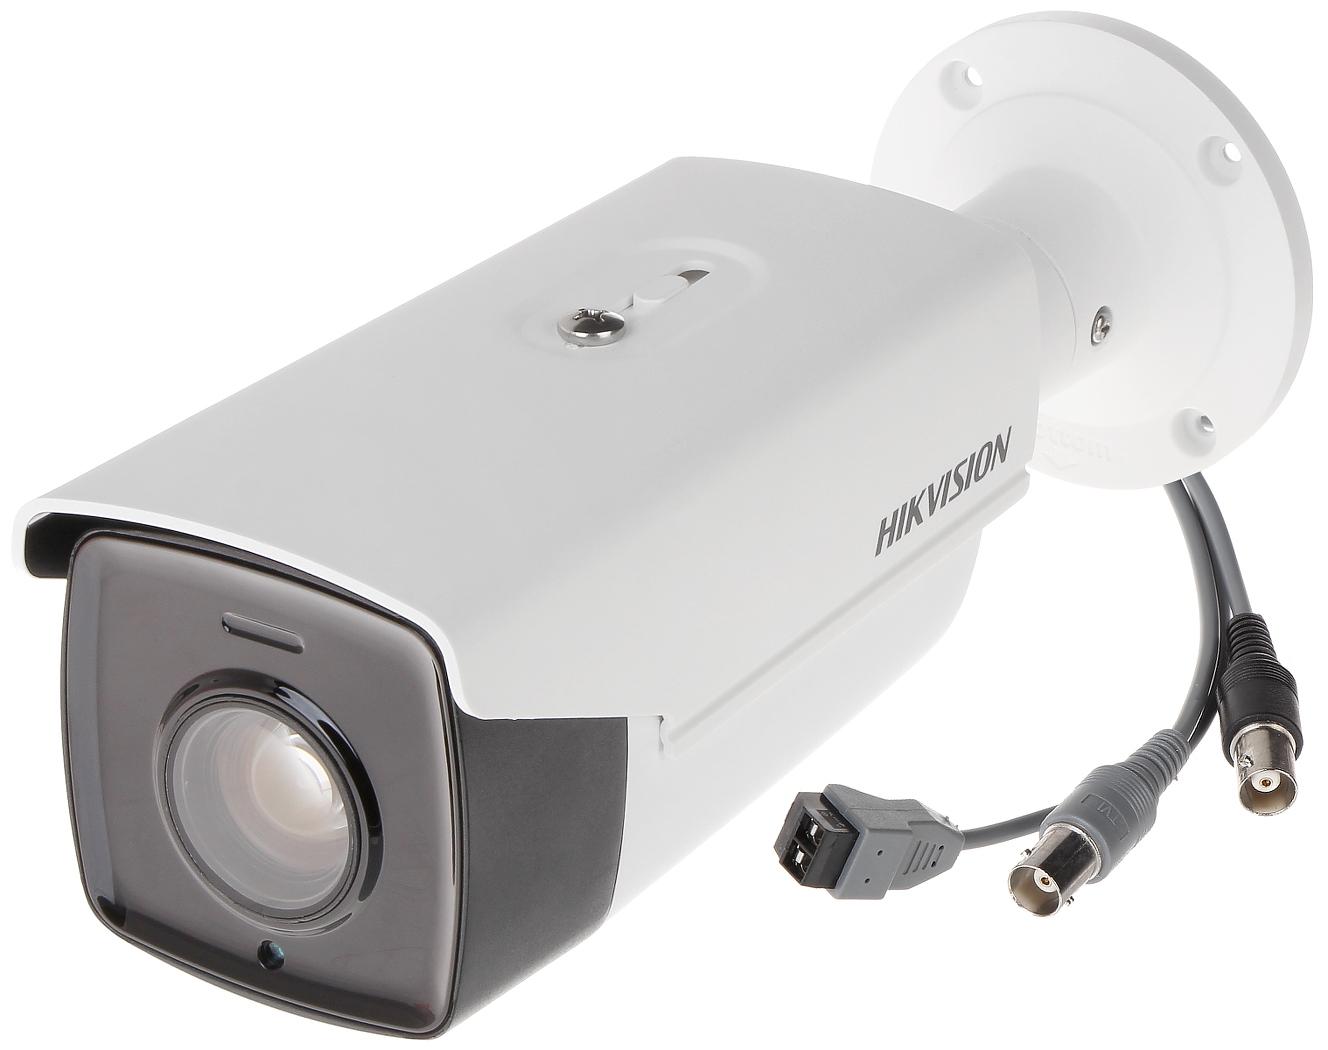 HD-TVI CAMERA DS-2CE16D9T-AIRAZH(5-50mm) - 1080p HIKVI